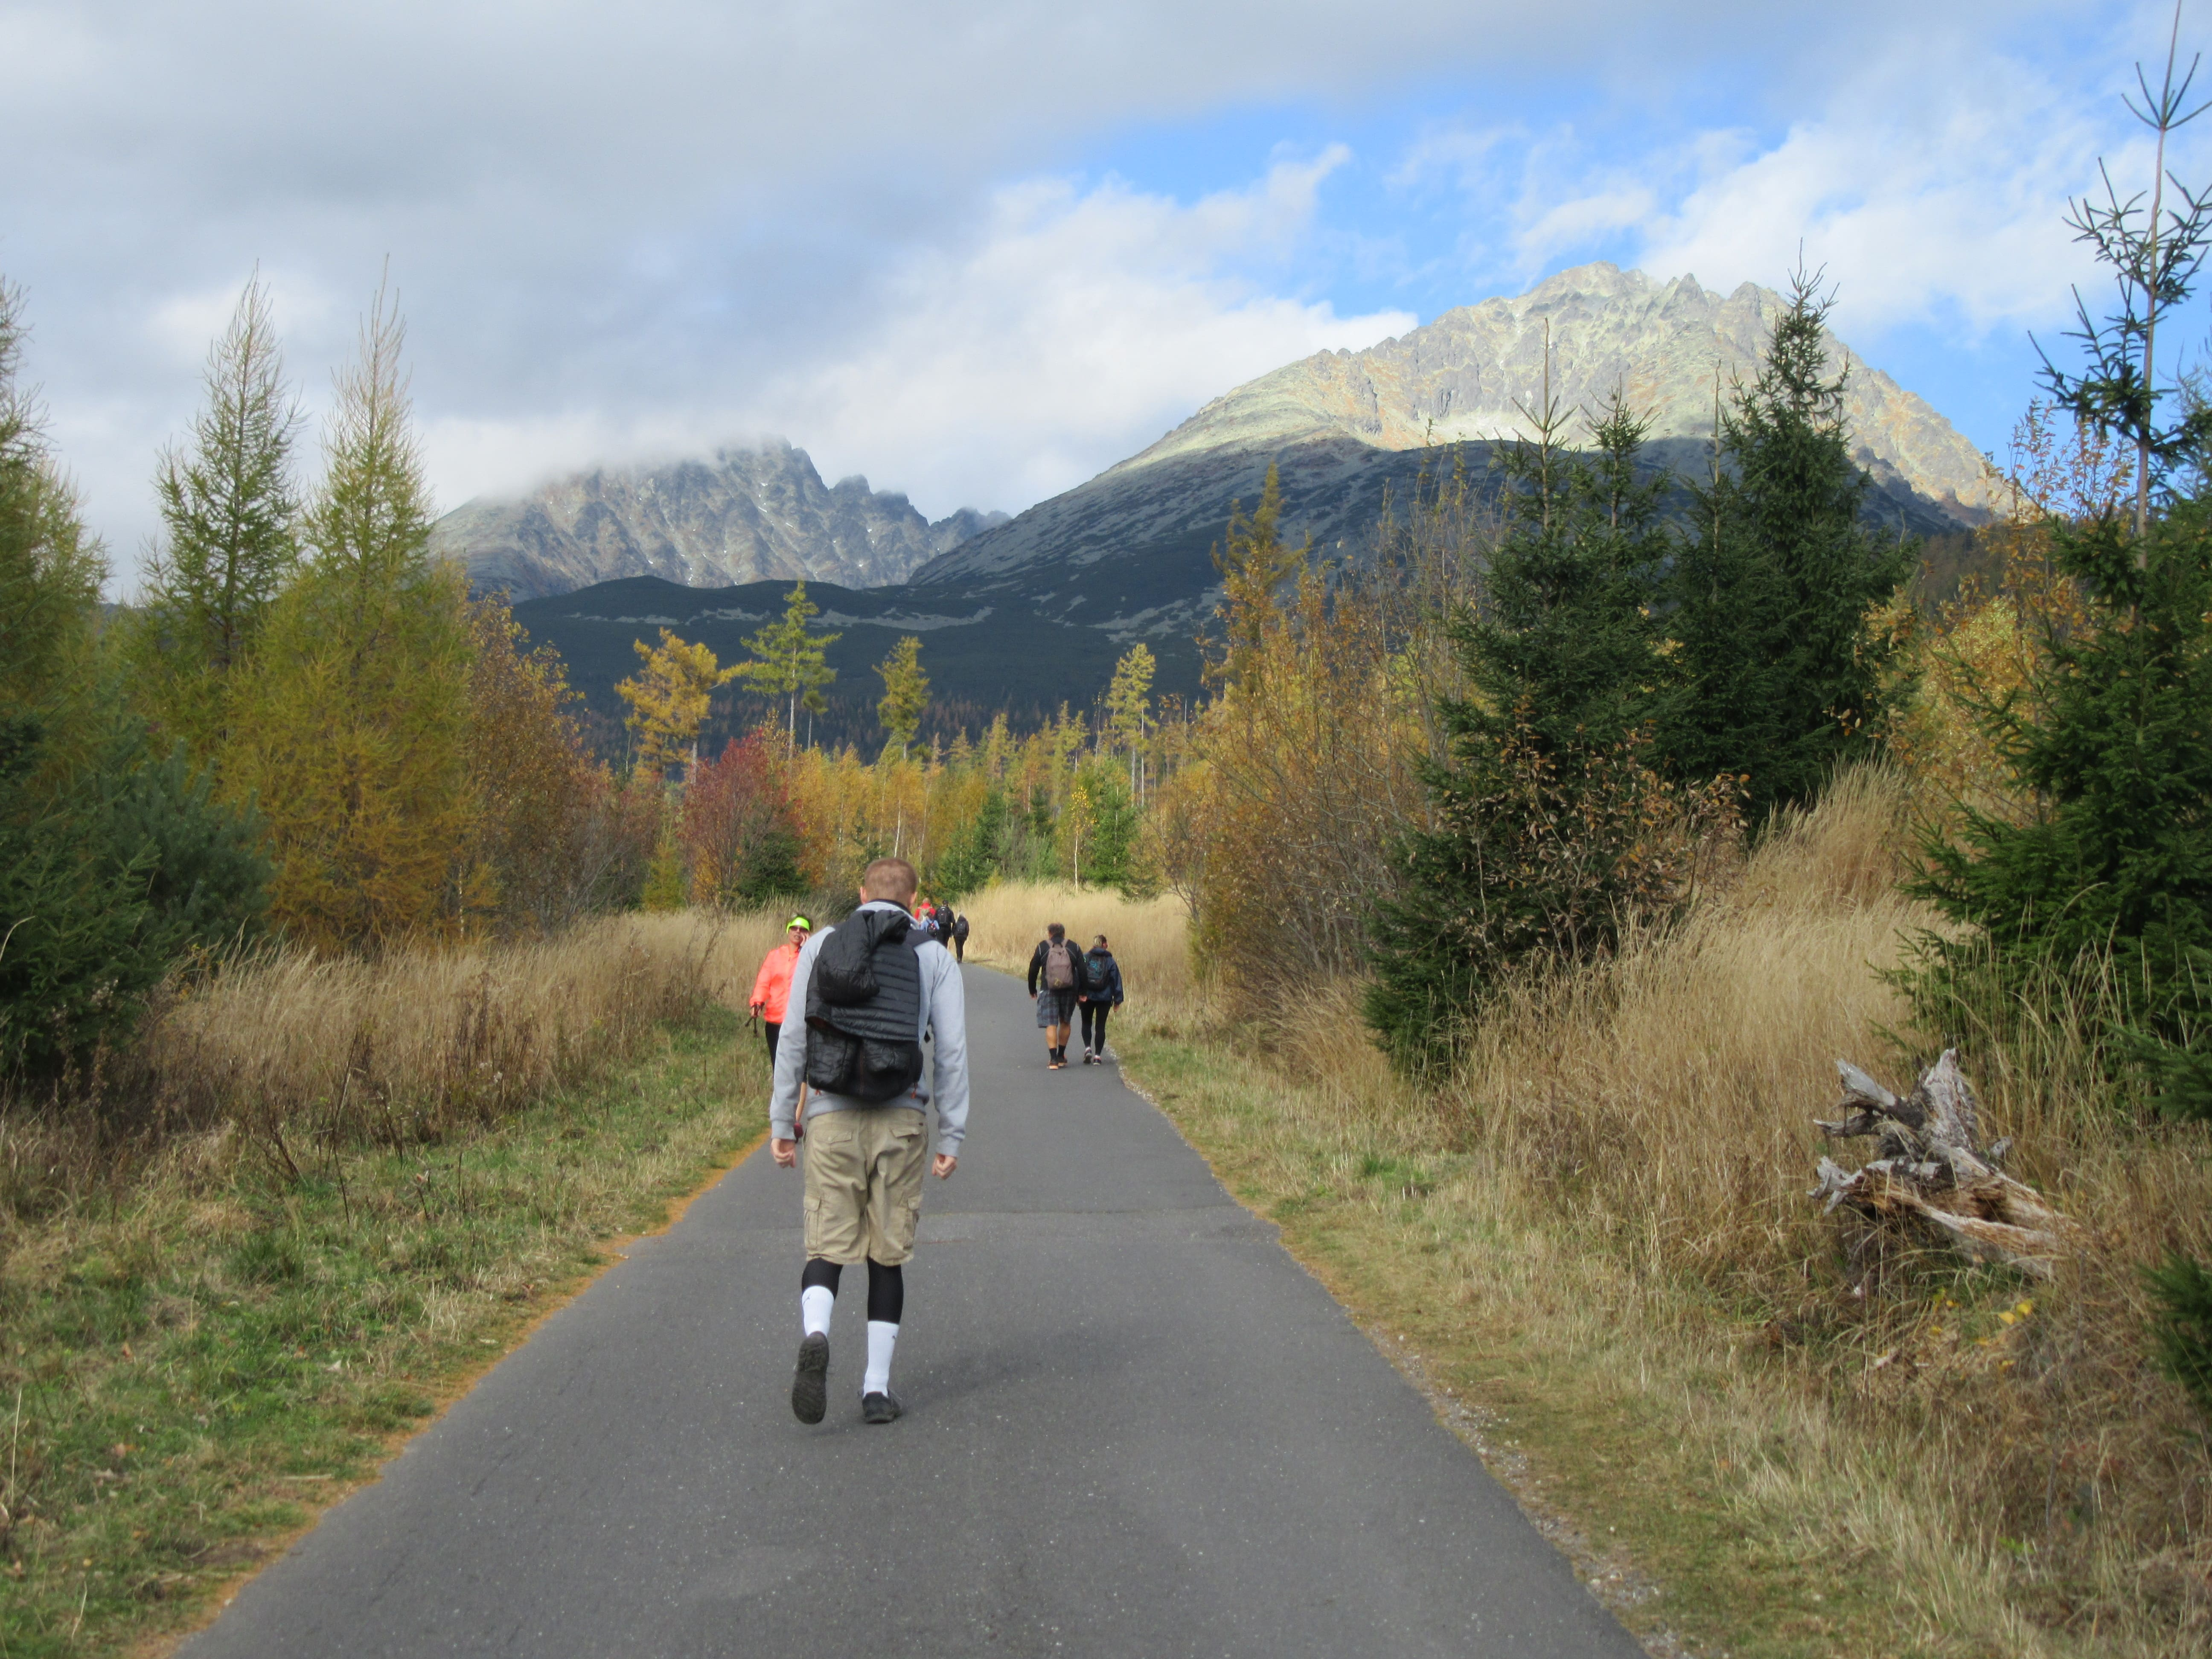 randonnée dans les hautes tatras en Slovaquie